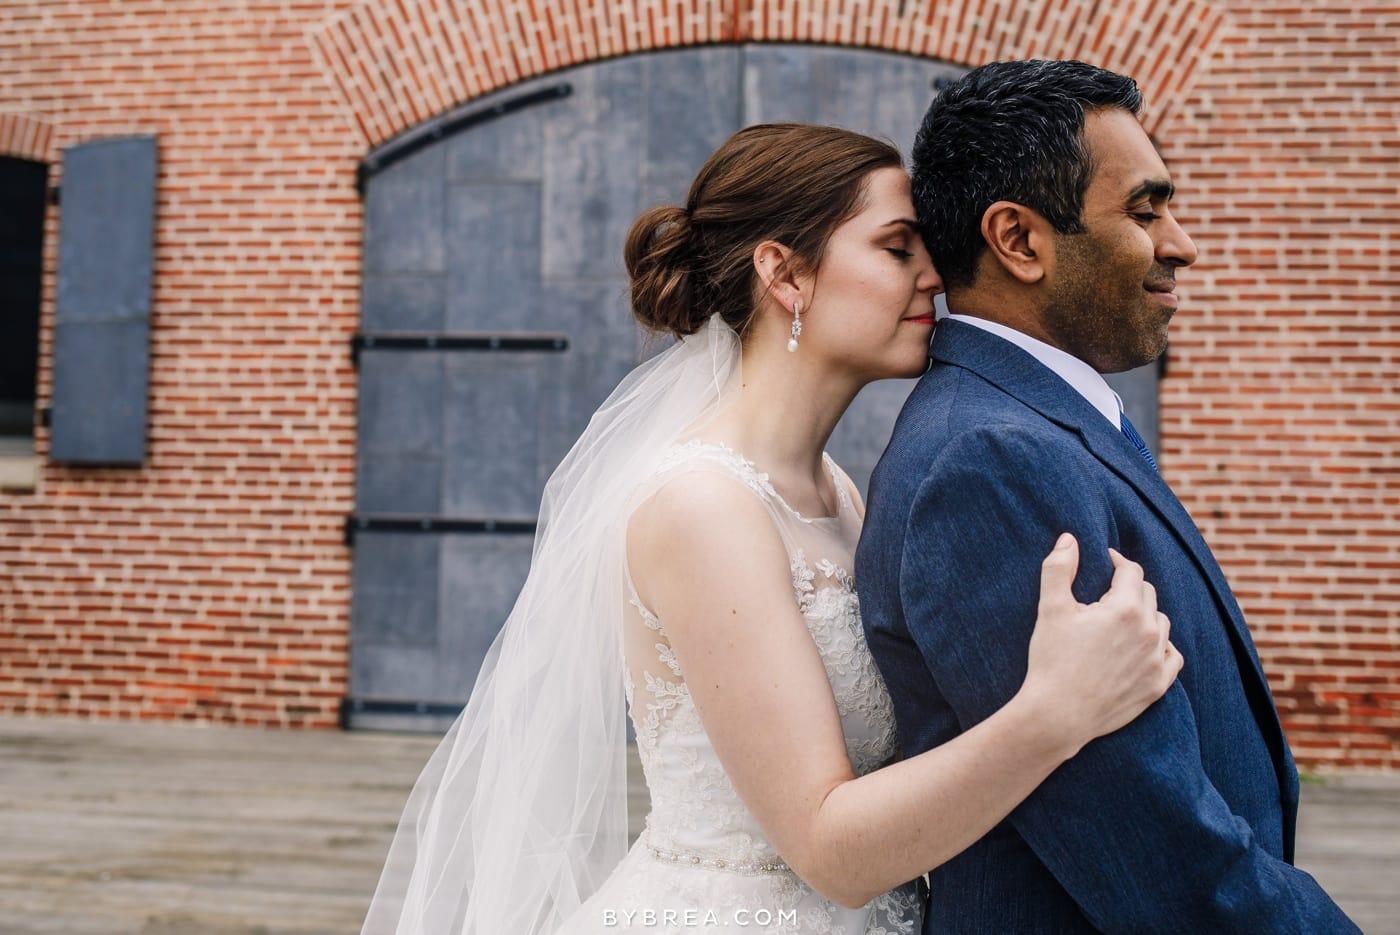 tracy-bharath-frederick-douglass-baltimore-wedding-photos_0277